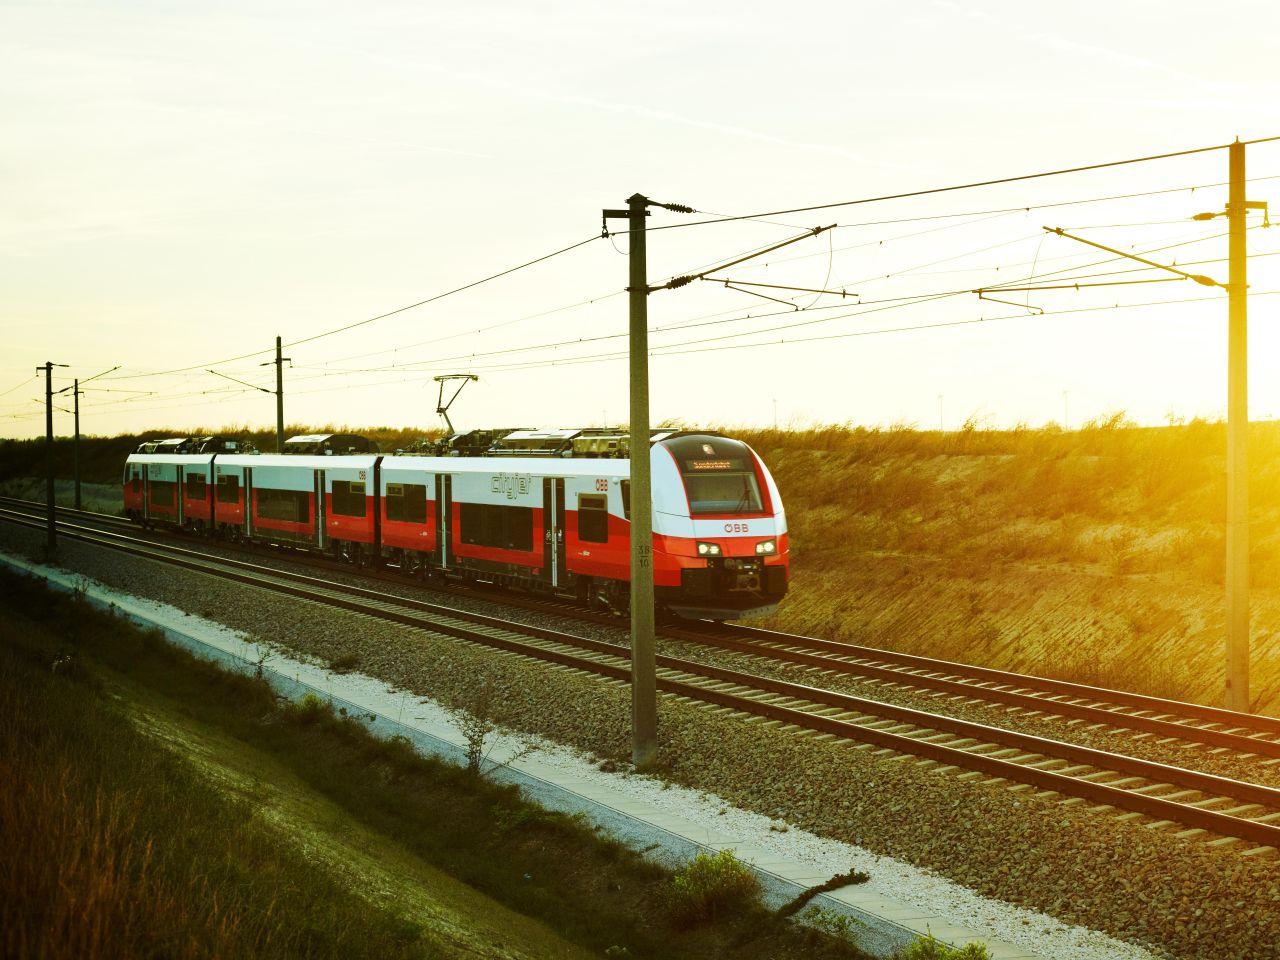 Jednotka Siemens Desiro ML. Foto: Philipp Horak / ÖBB